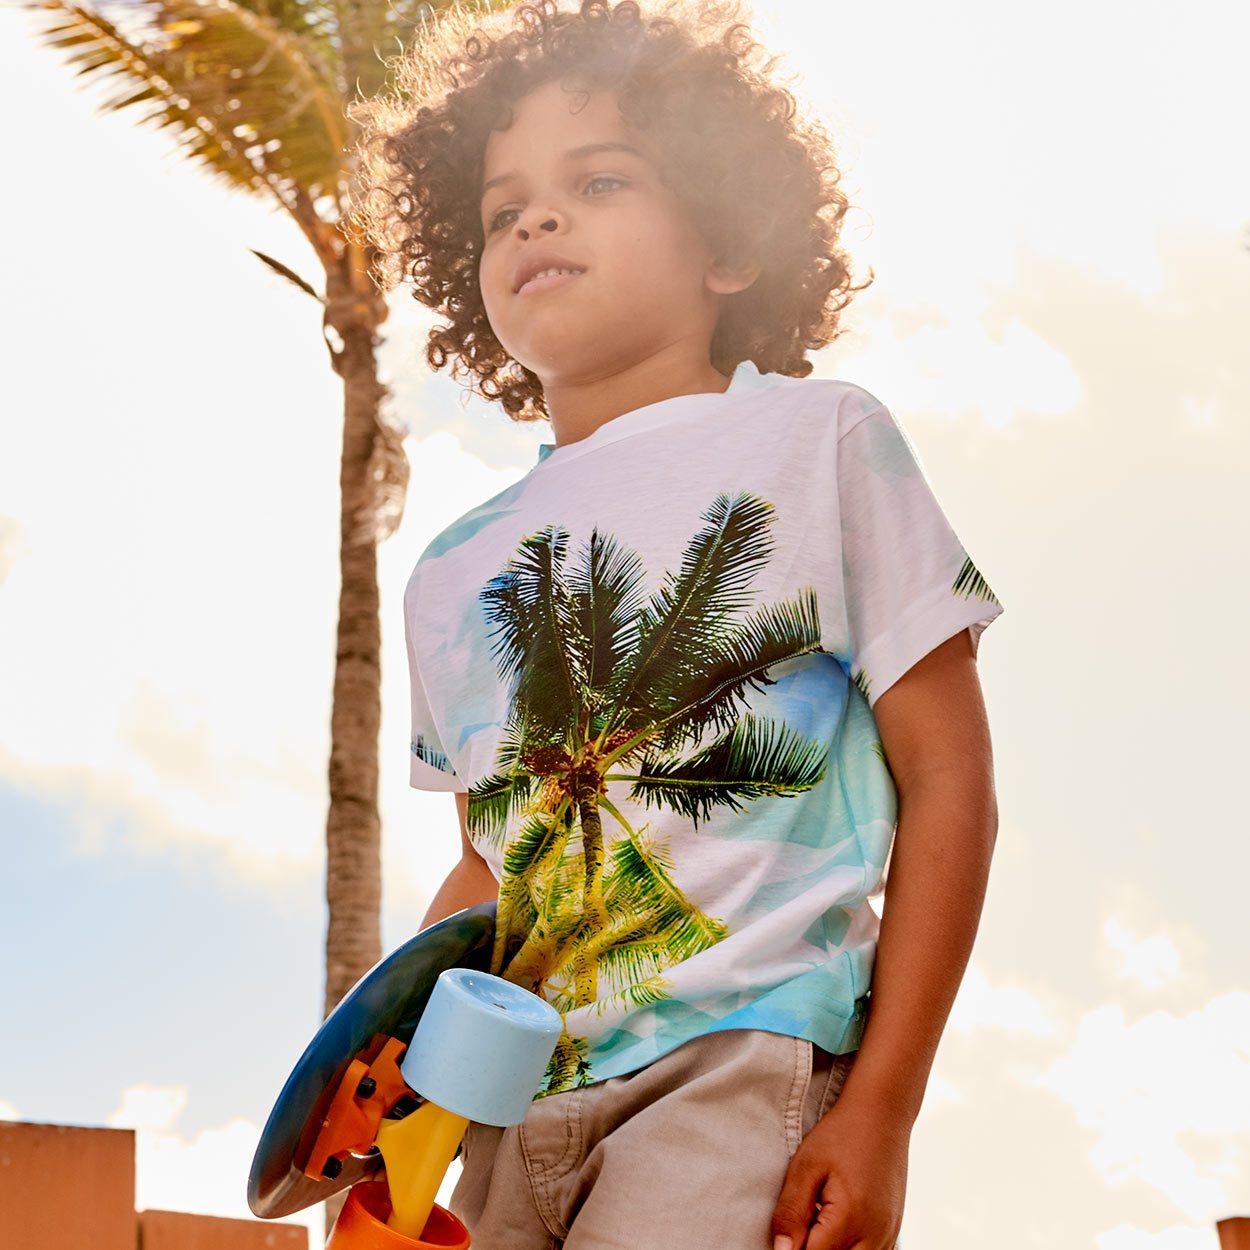 Kids Palm Trees Photo Tshirt White Green Blue Size Xs L Unisex Geo Tropical Skater Boy At The Beach Holding His Skateboard Sunpoplife